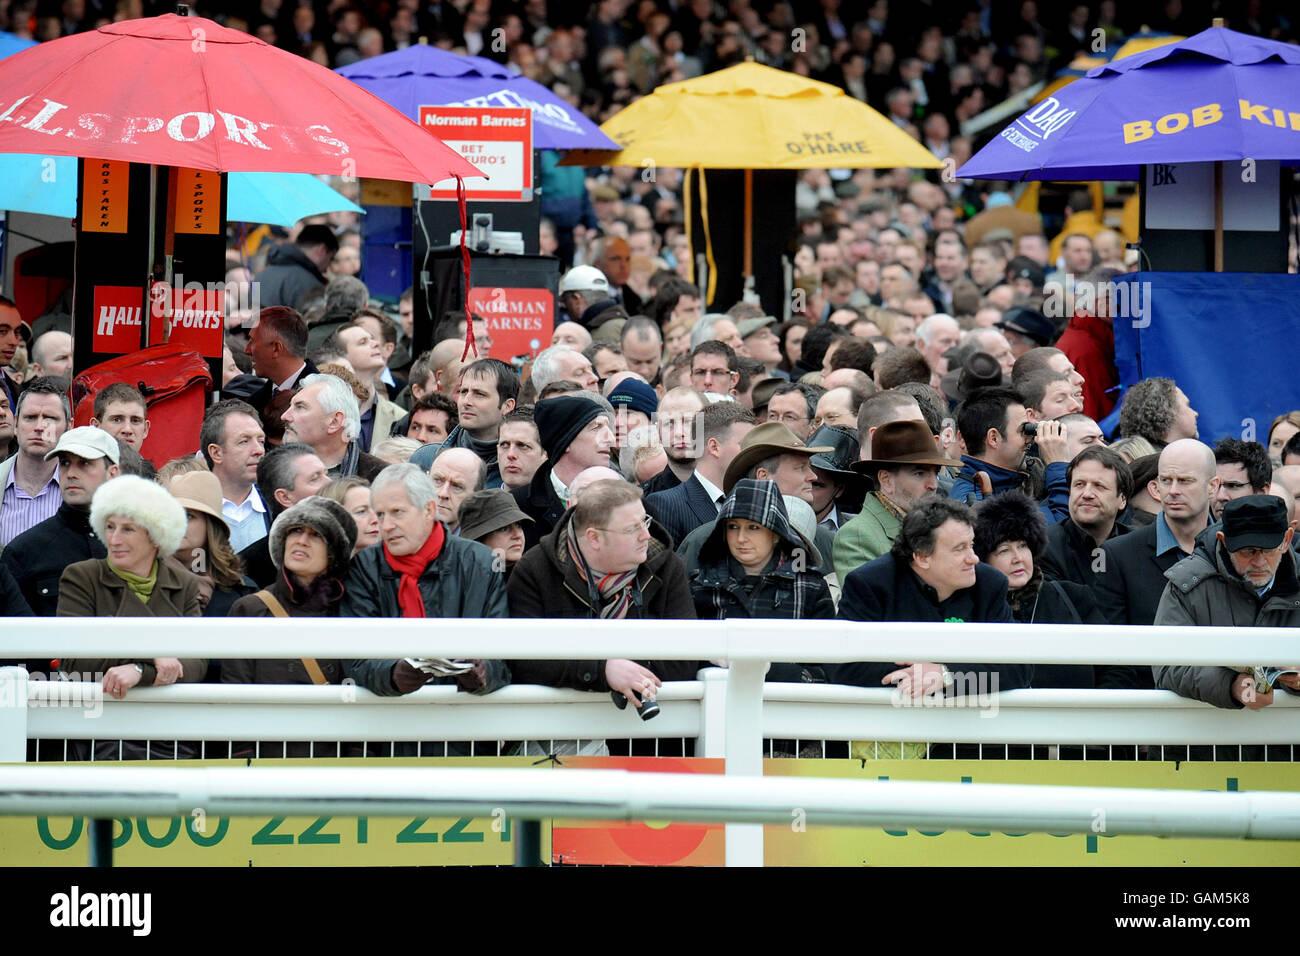 Horse Racing - Cheltenham Festival - Day Four - Cheltenham Racecourse Stock Photo